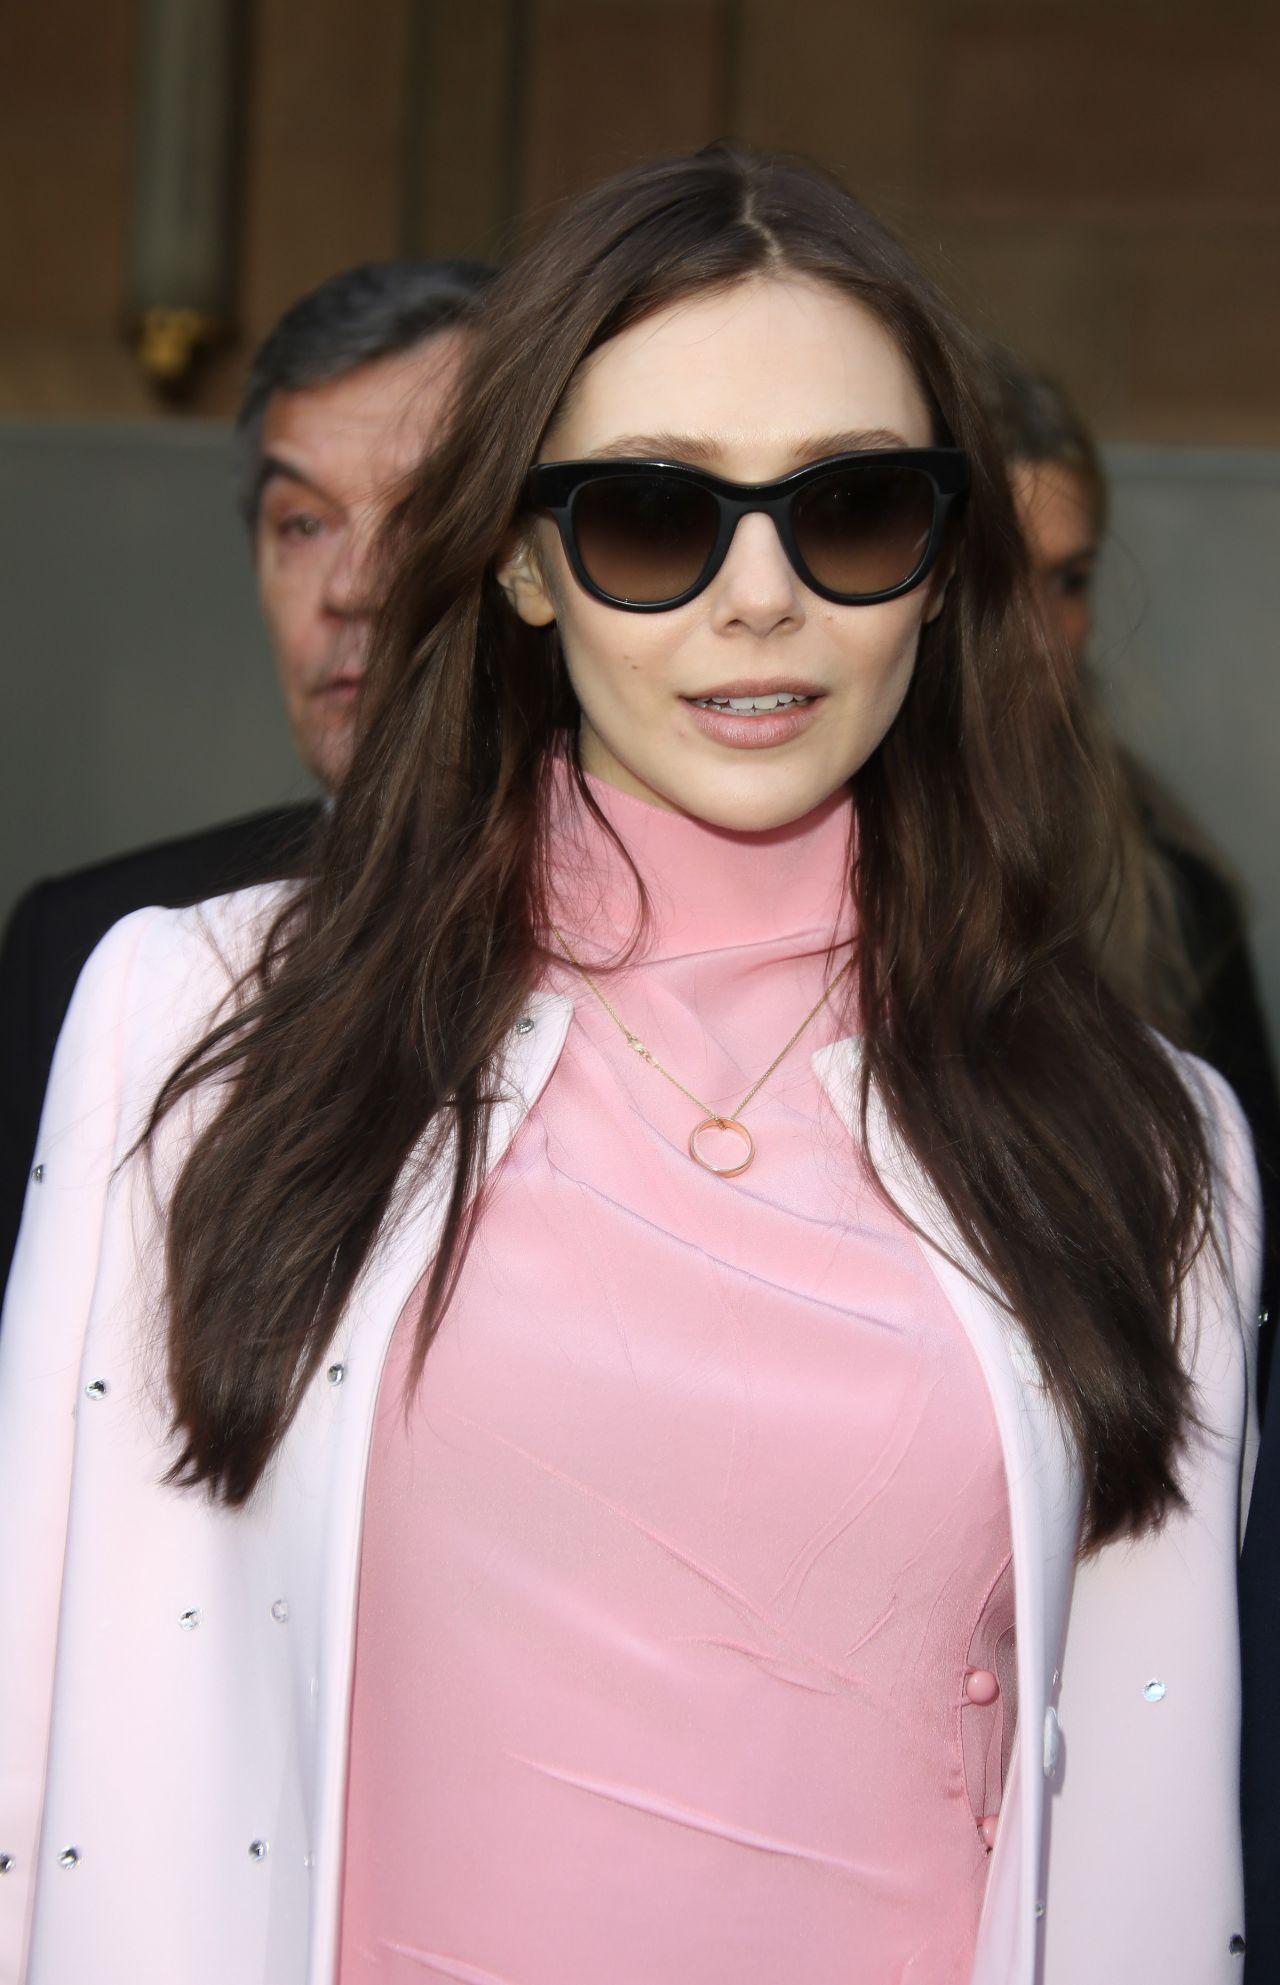 Elizabeth Olsen in Paris - Miu Miu Fashion Show, March 2014